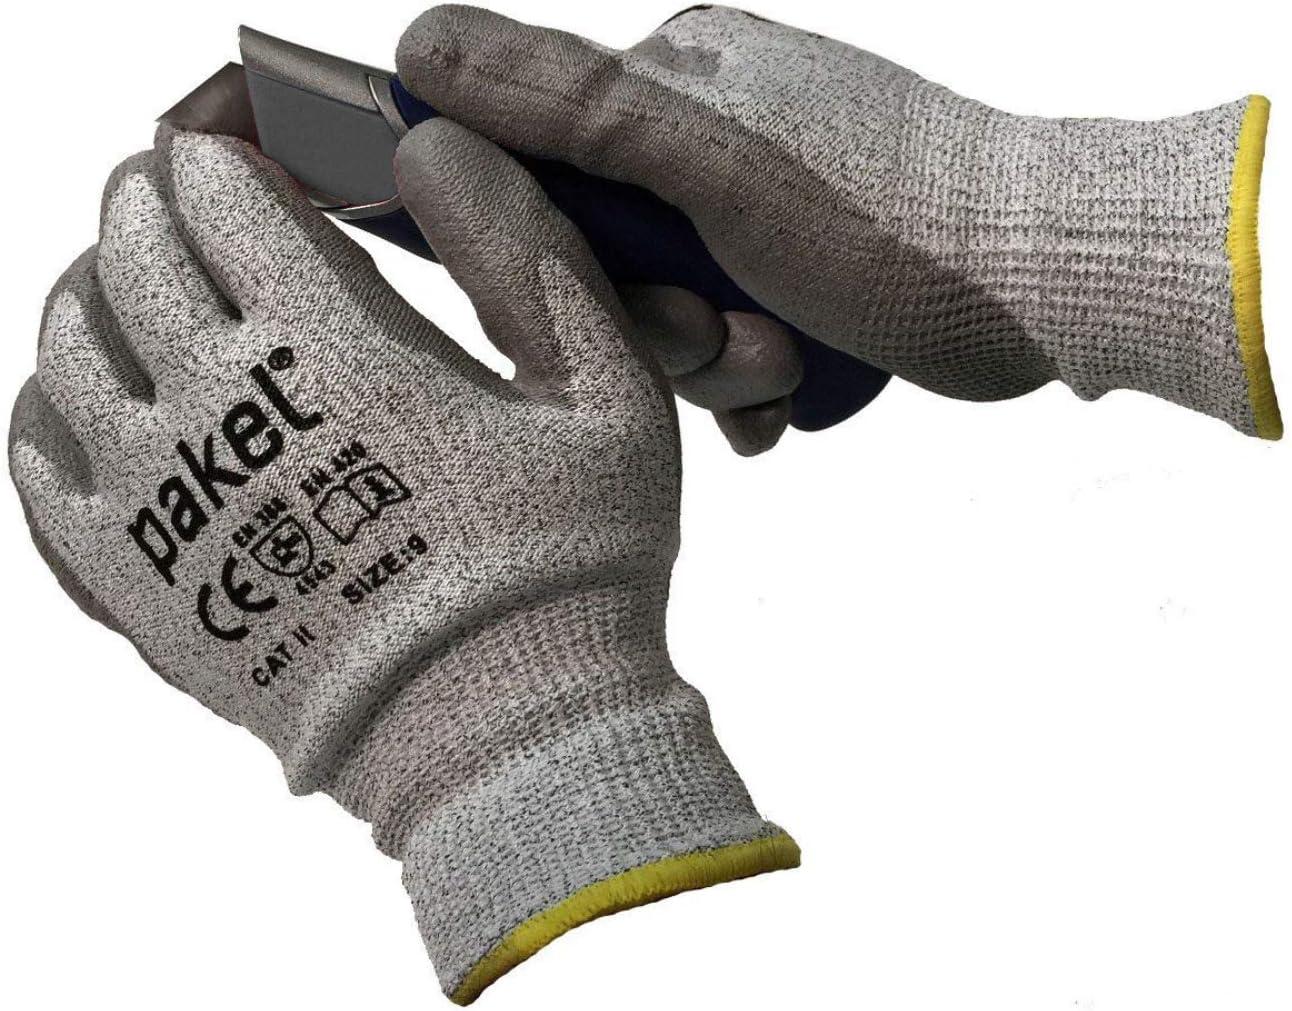 Pakel High Performance En388 CE Nashville-Davidson Mall gift Level Cut Resistant 5 Wrist Knit